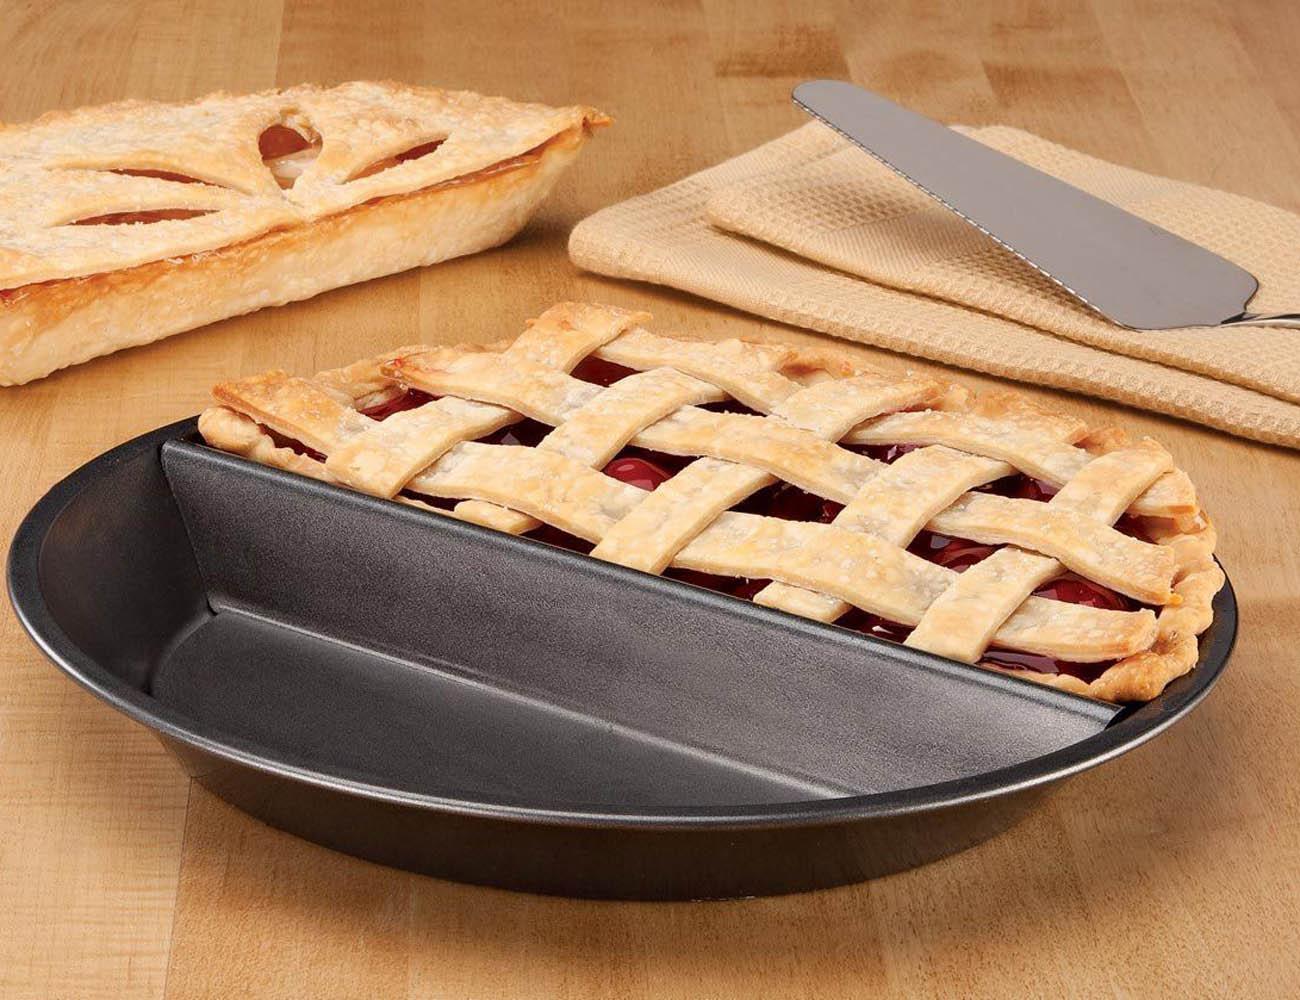 Split+Decision+Pie+Pan